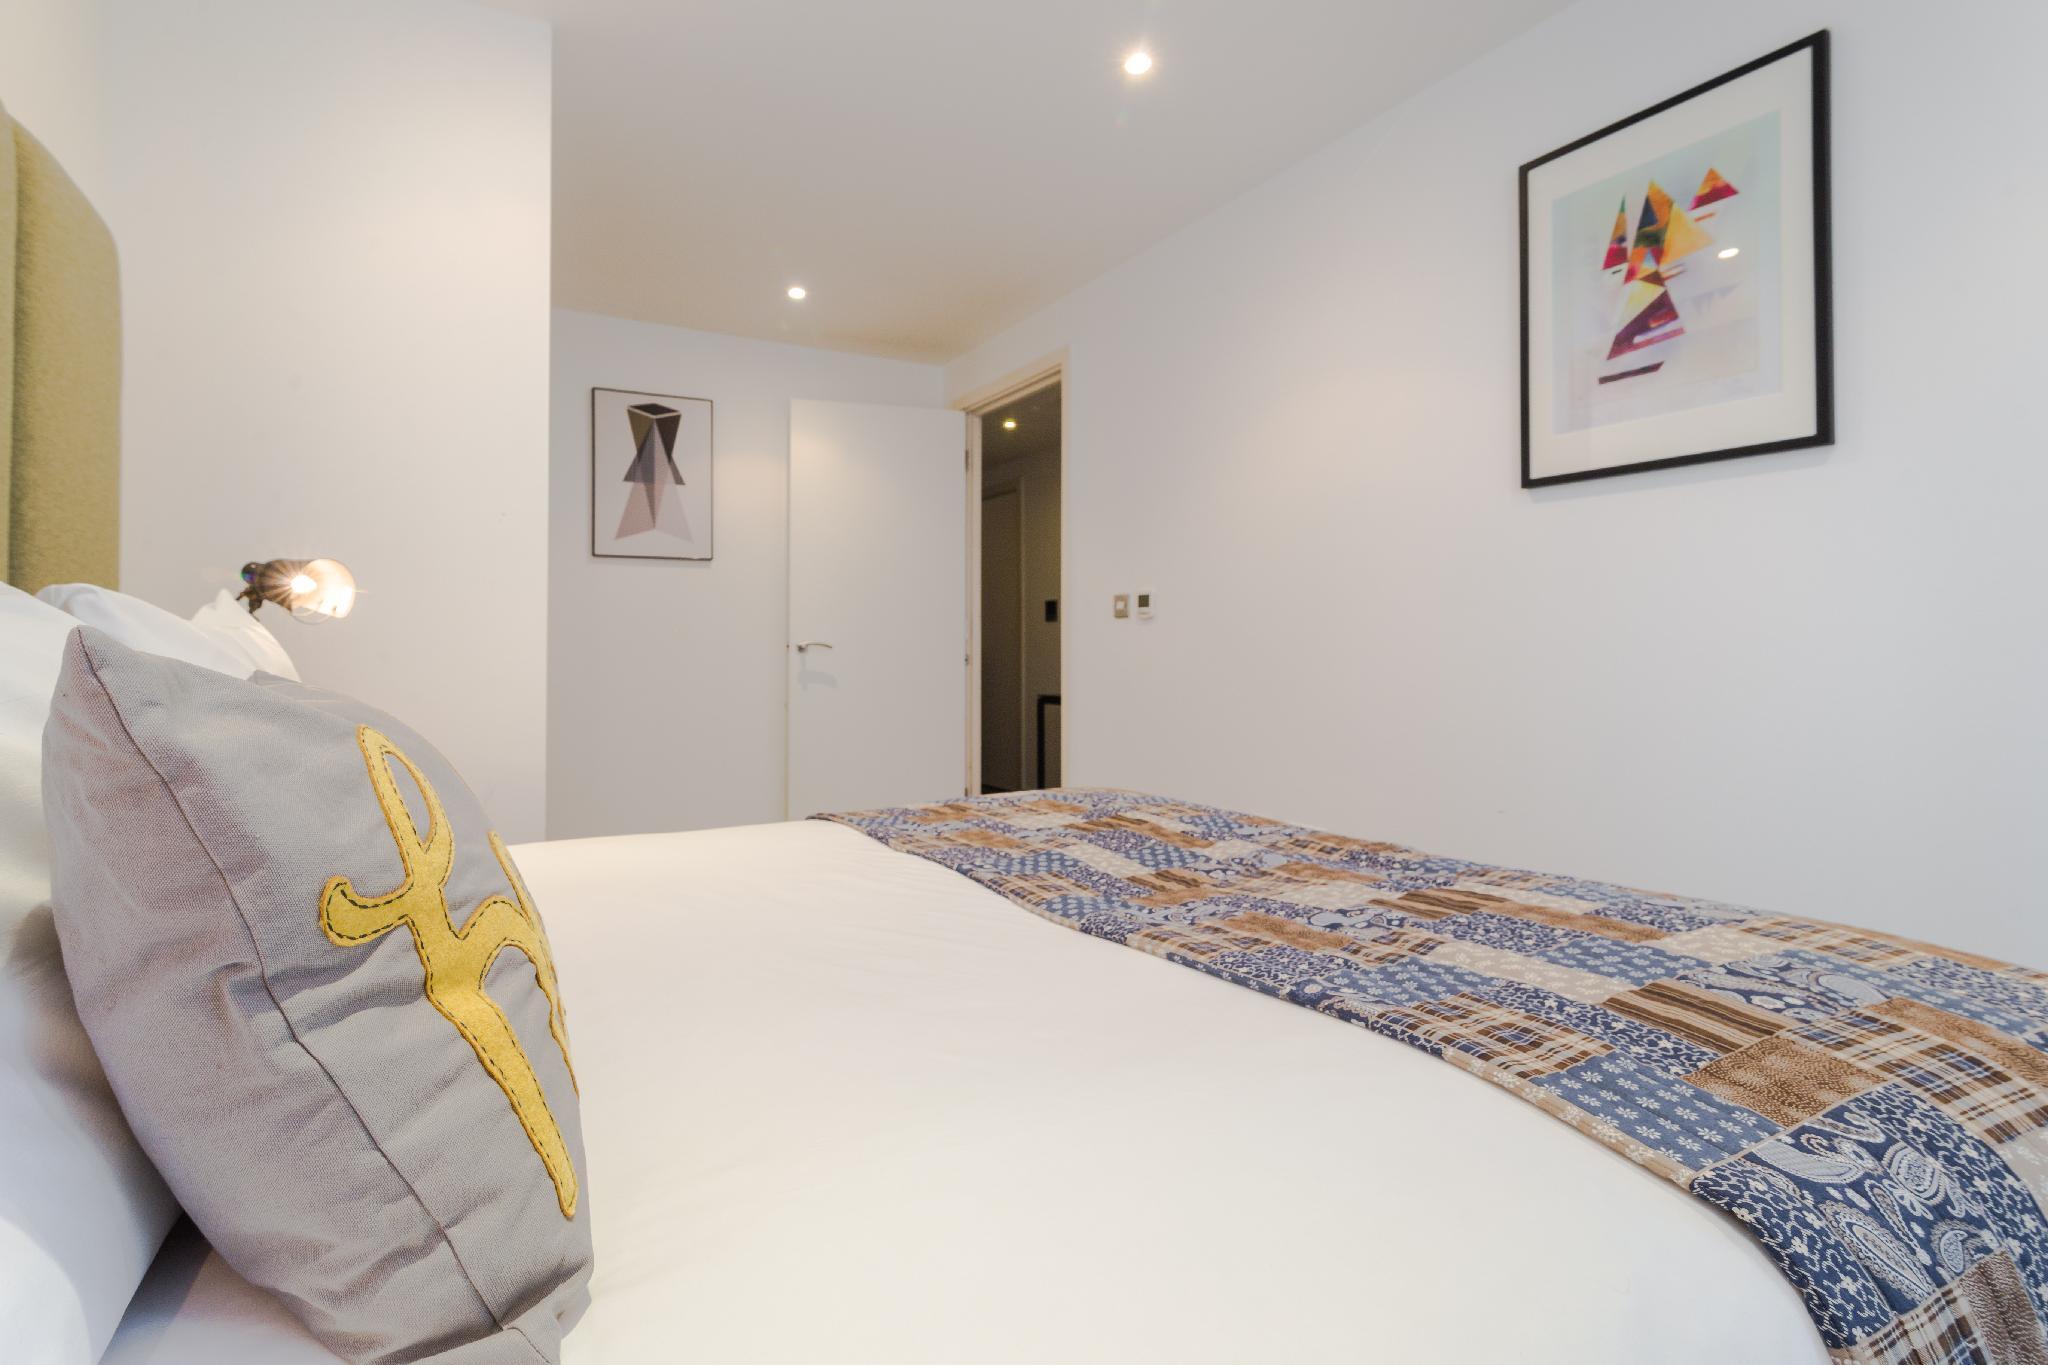 Bijou Delight by Austin David Apartments